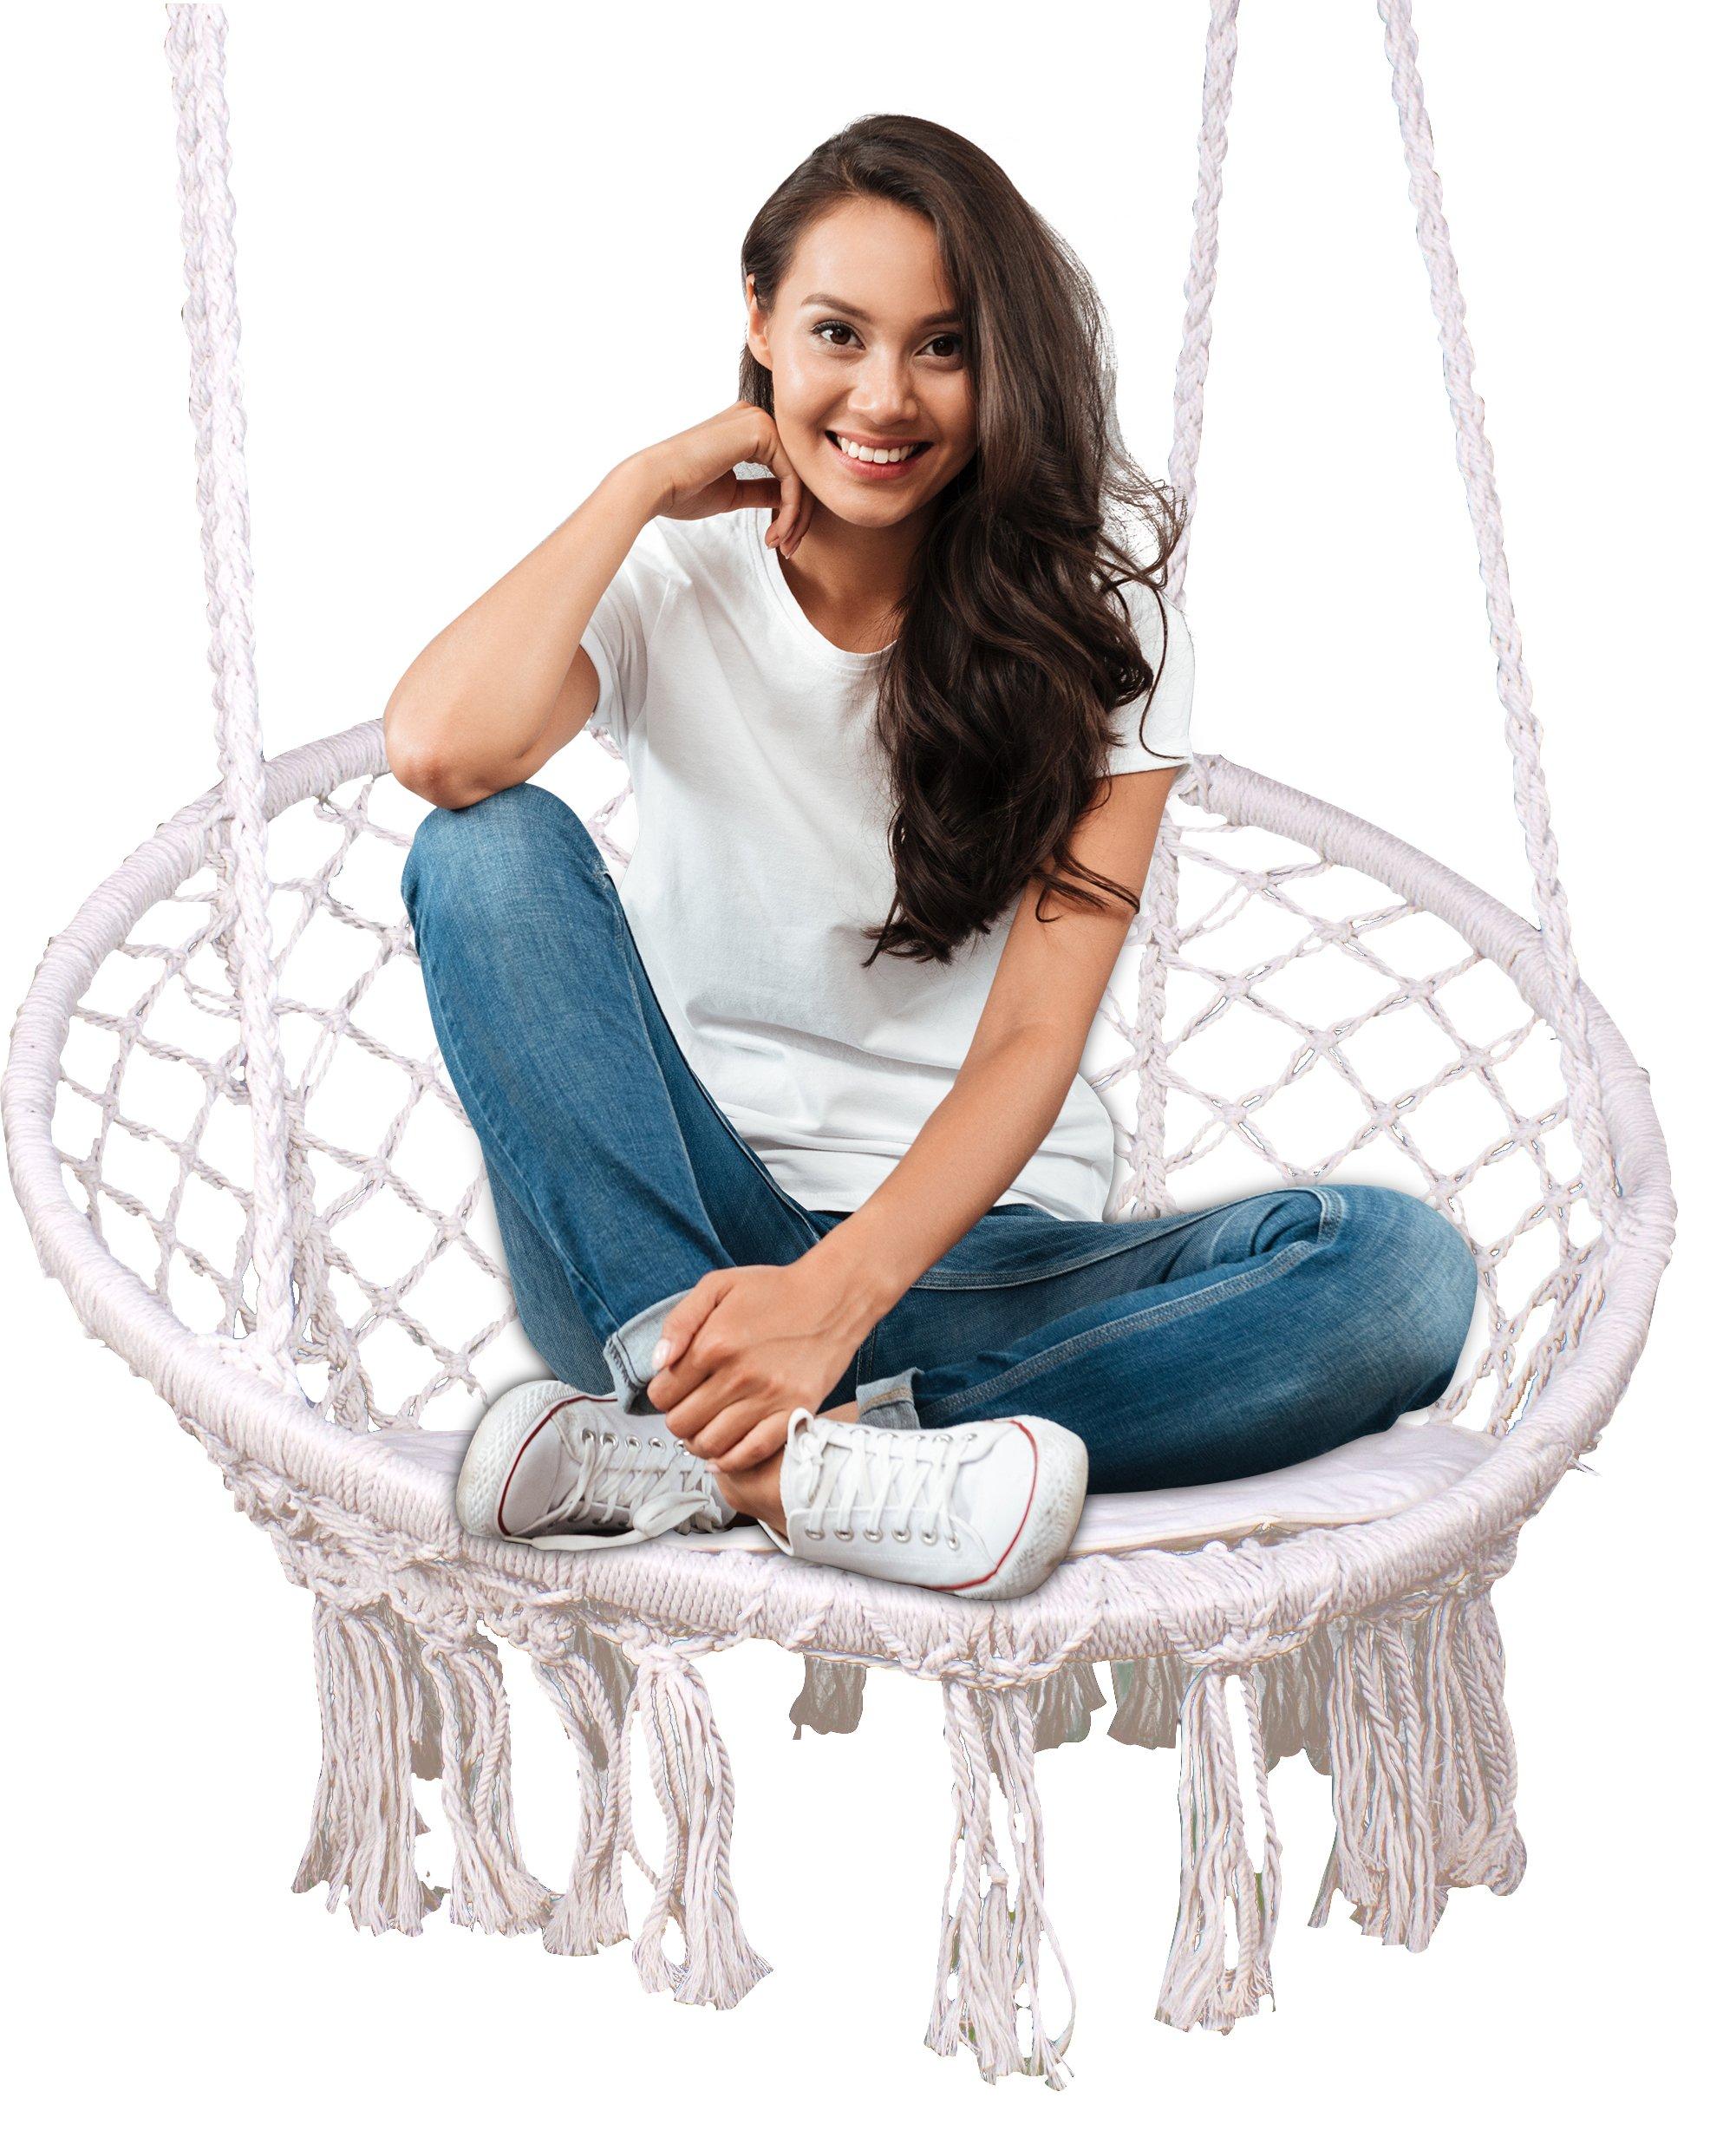 Feiren Outdoor hammock chair Indoor Livingroom hanging Macrame Chairs swing hammock rattan chair Home deco / boho style / Patio cushion / swinging chair for bedroom / hanging chairs